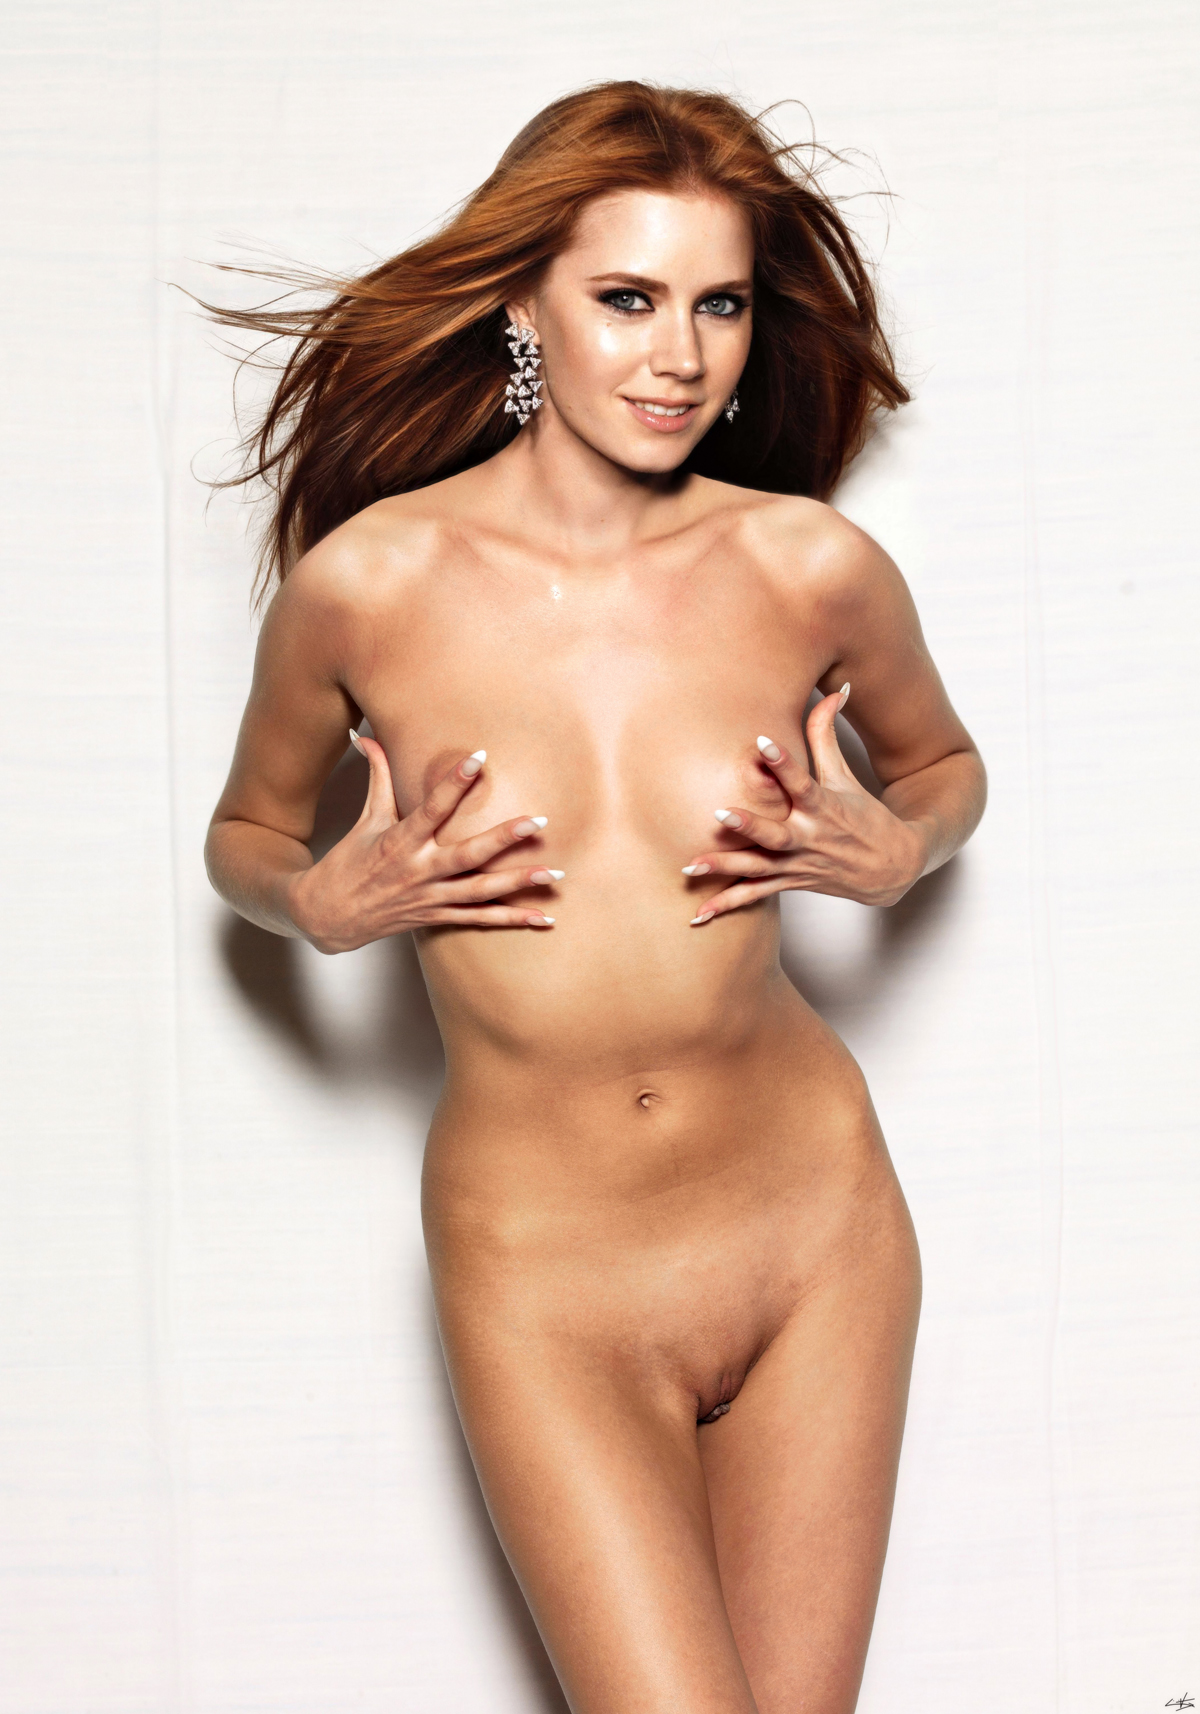 Amy Adams Nipples amy adams fully nude & rubbing her hard nipples fake